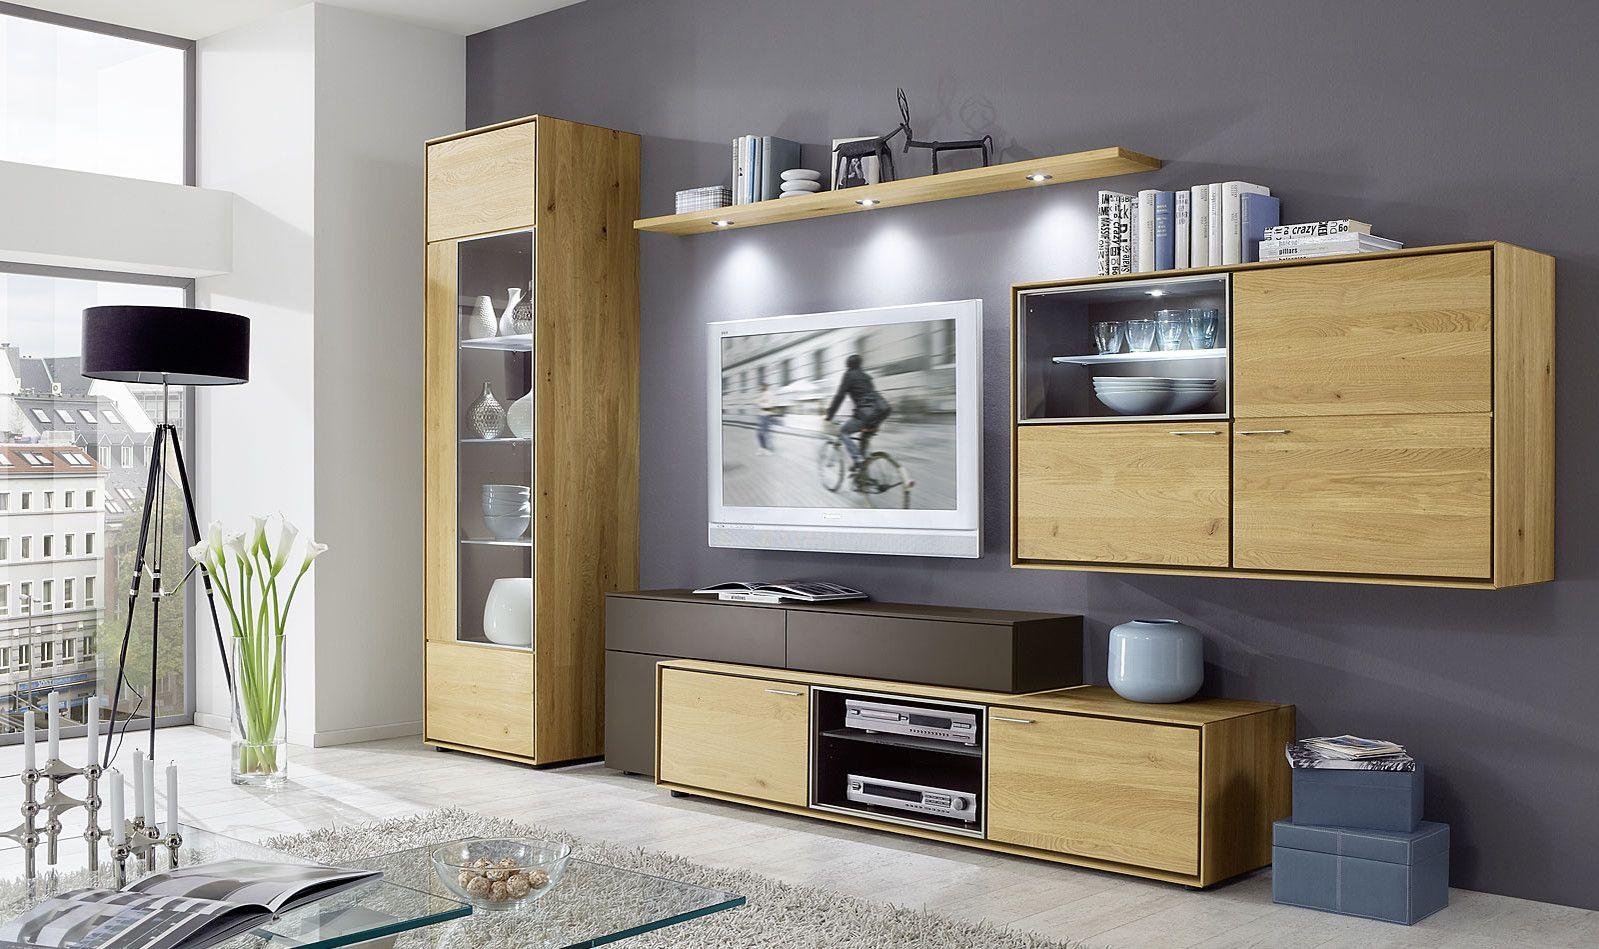 laurea - Ranges - Living Rooms - Venjakob Möbel | Modular Euro ...